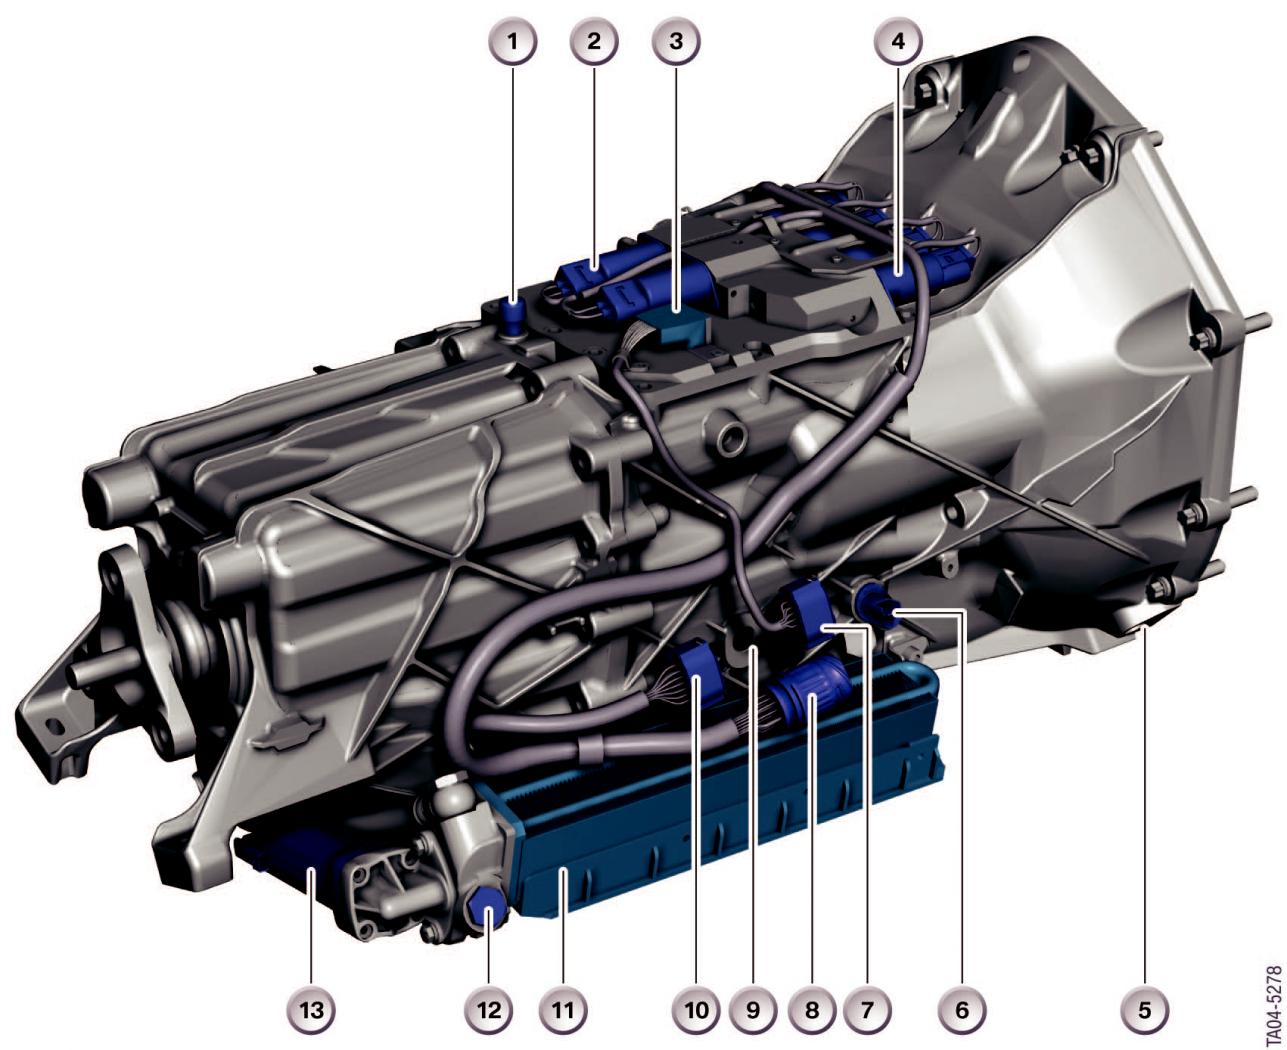 Boite-de-vitesse-SMG3.jpeg